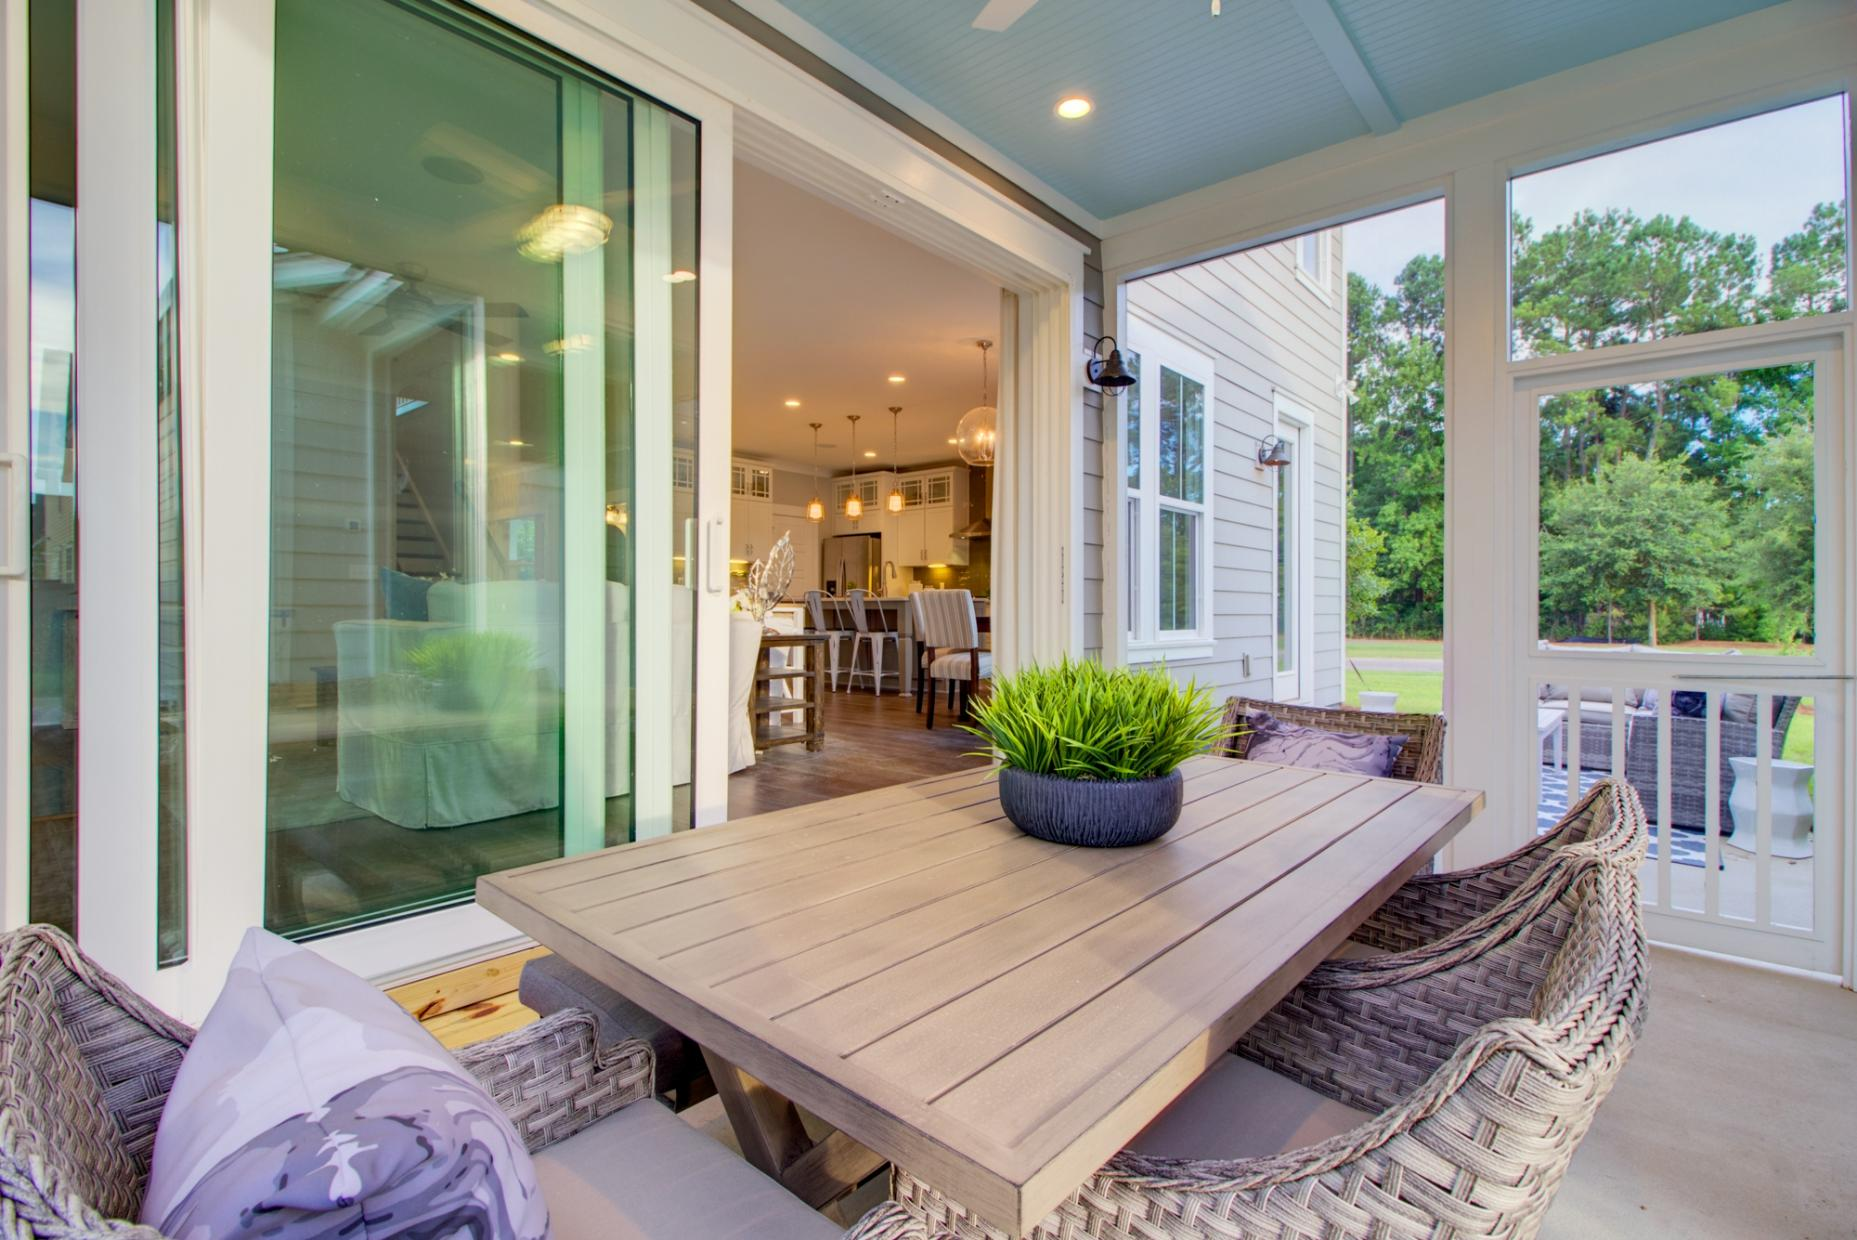 Carnes Crossroads Homes For Sale - 501 Wodin, Summerville, SC - 19